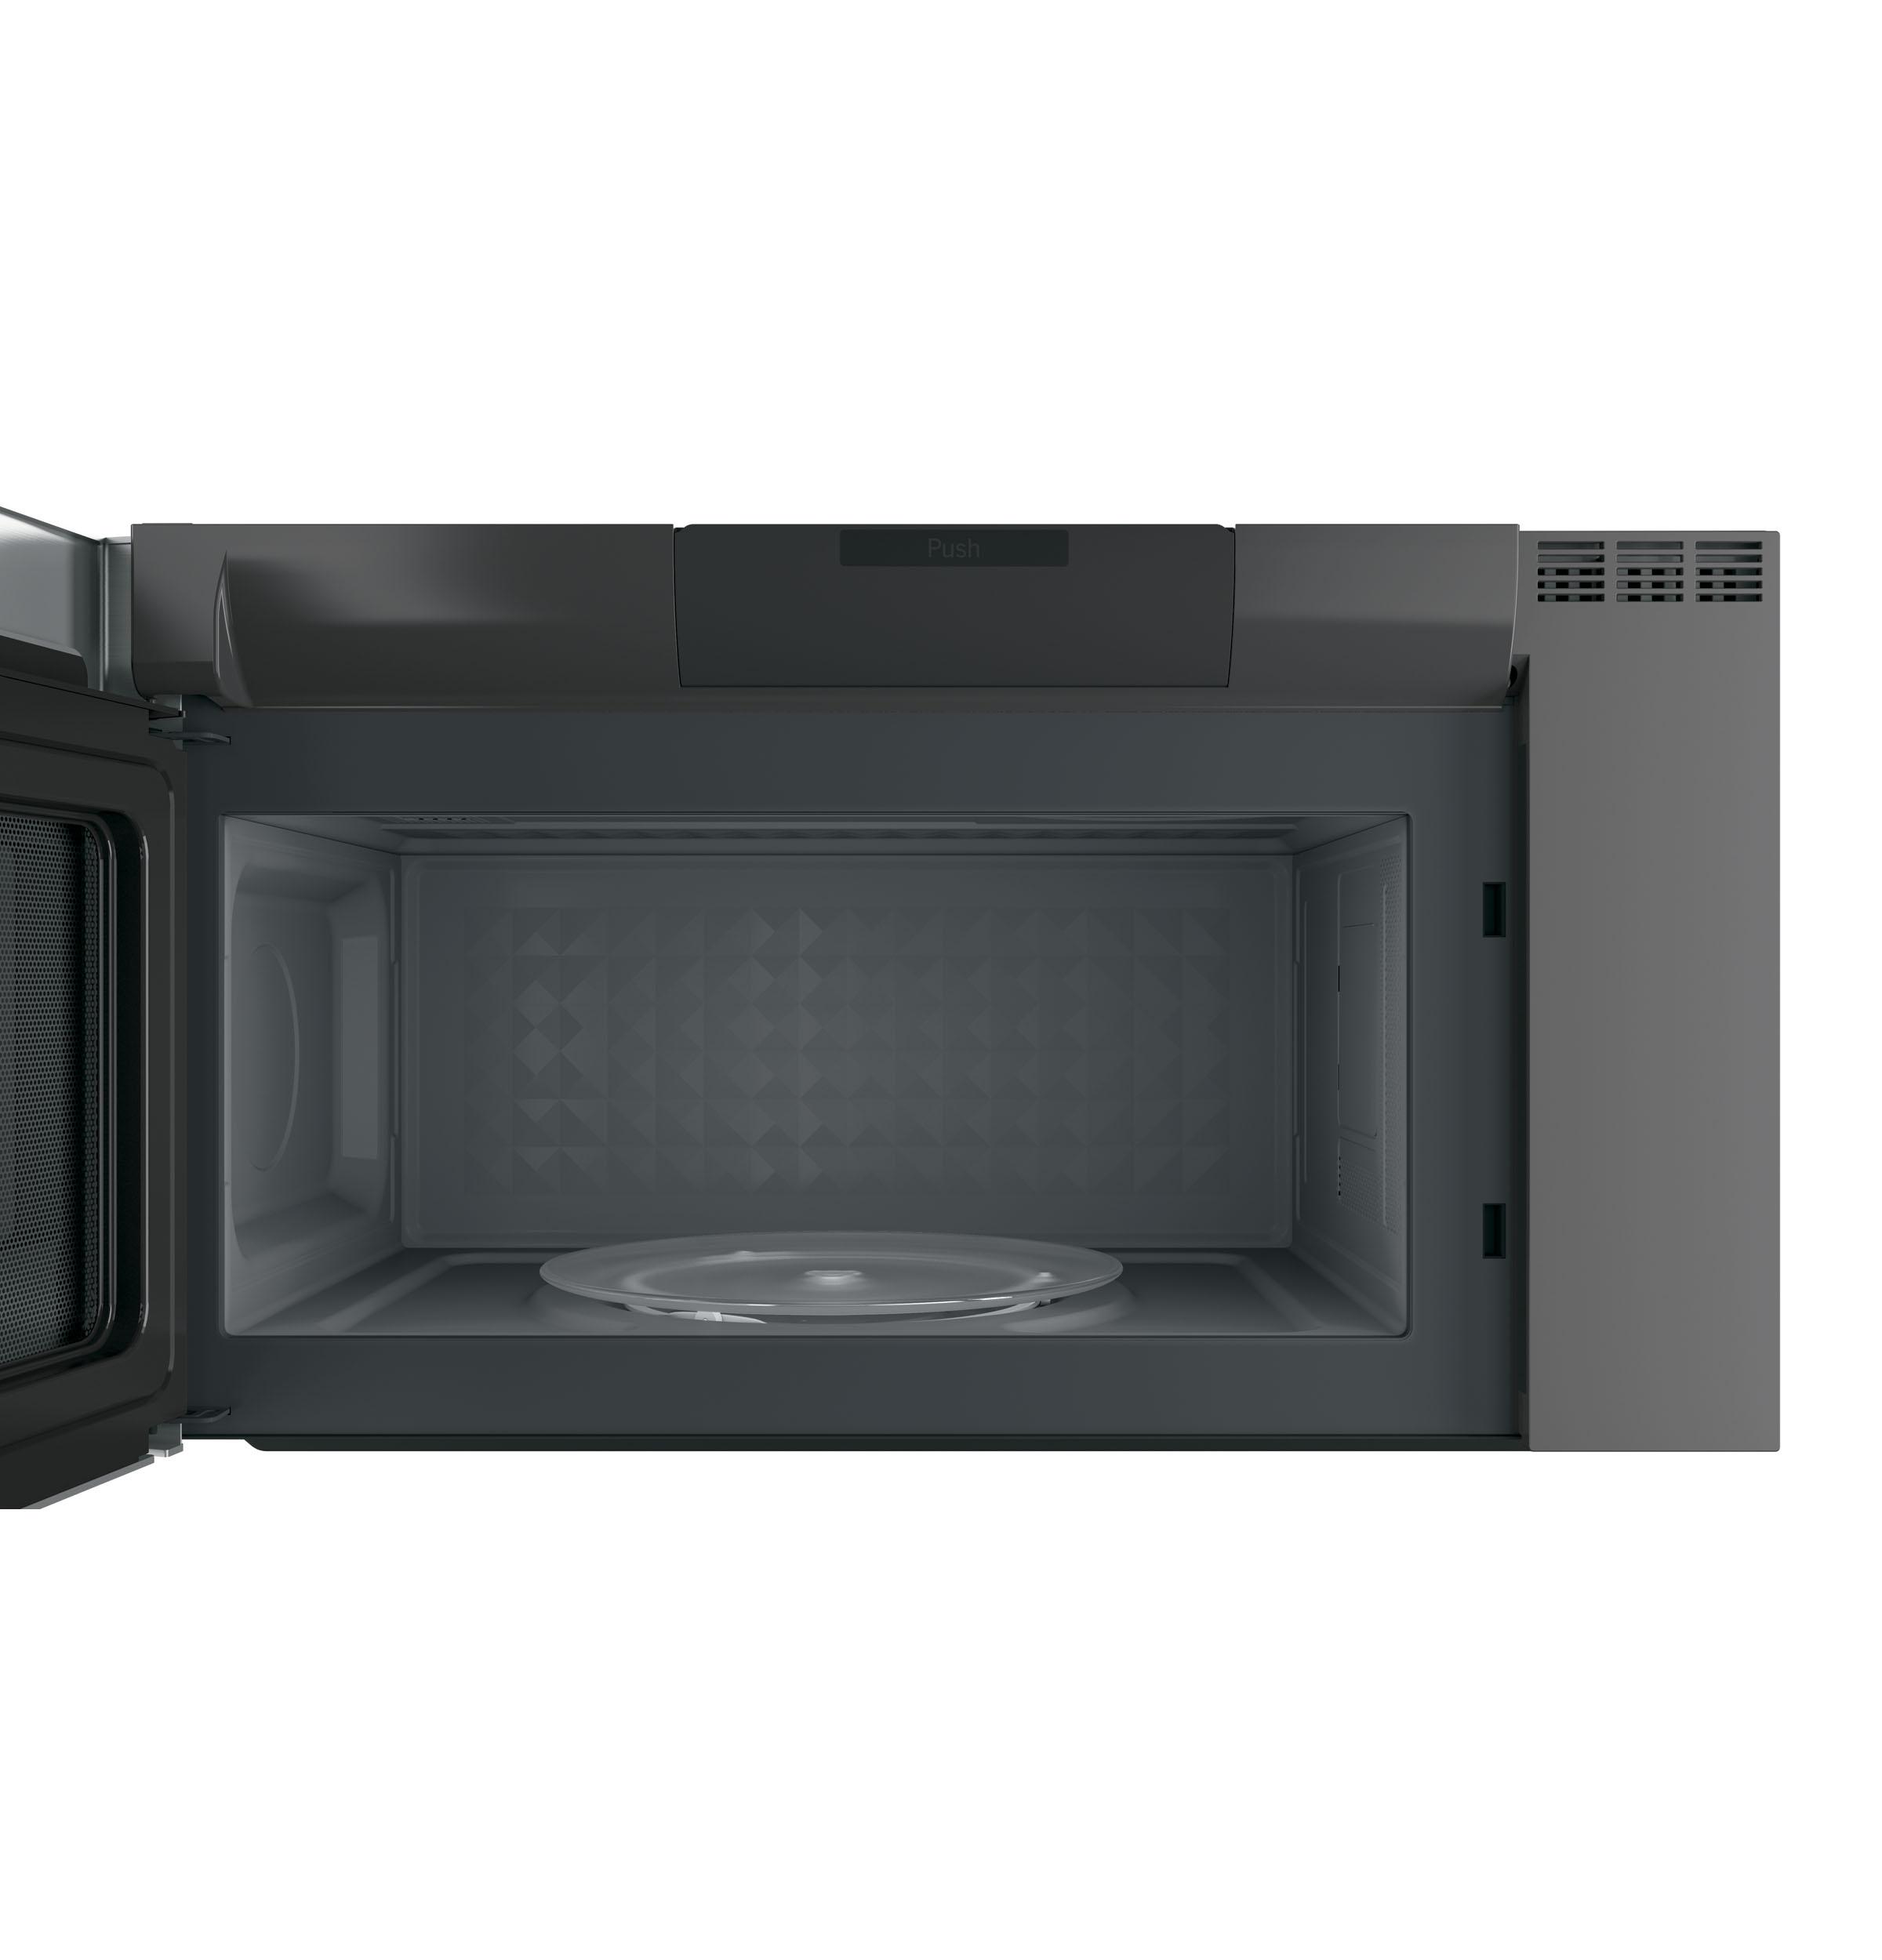 Model: PVM9005SJSS | GE Profile GE Profile™ 2.1 Cu. Ft. Over-the-Range Sensor Microwave Oven